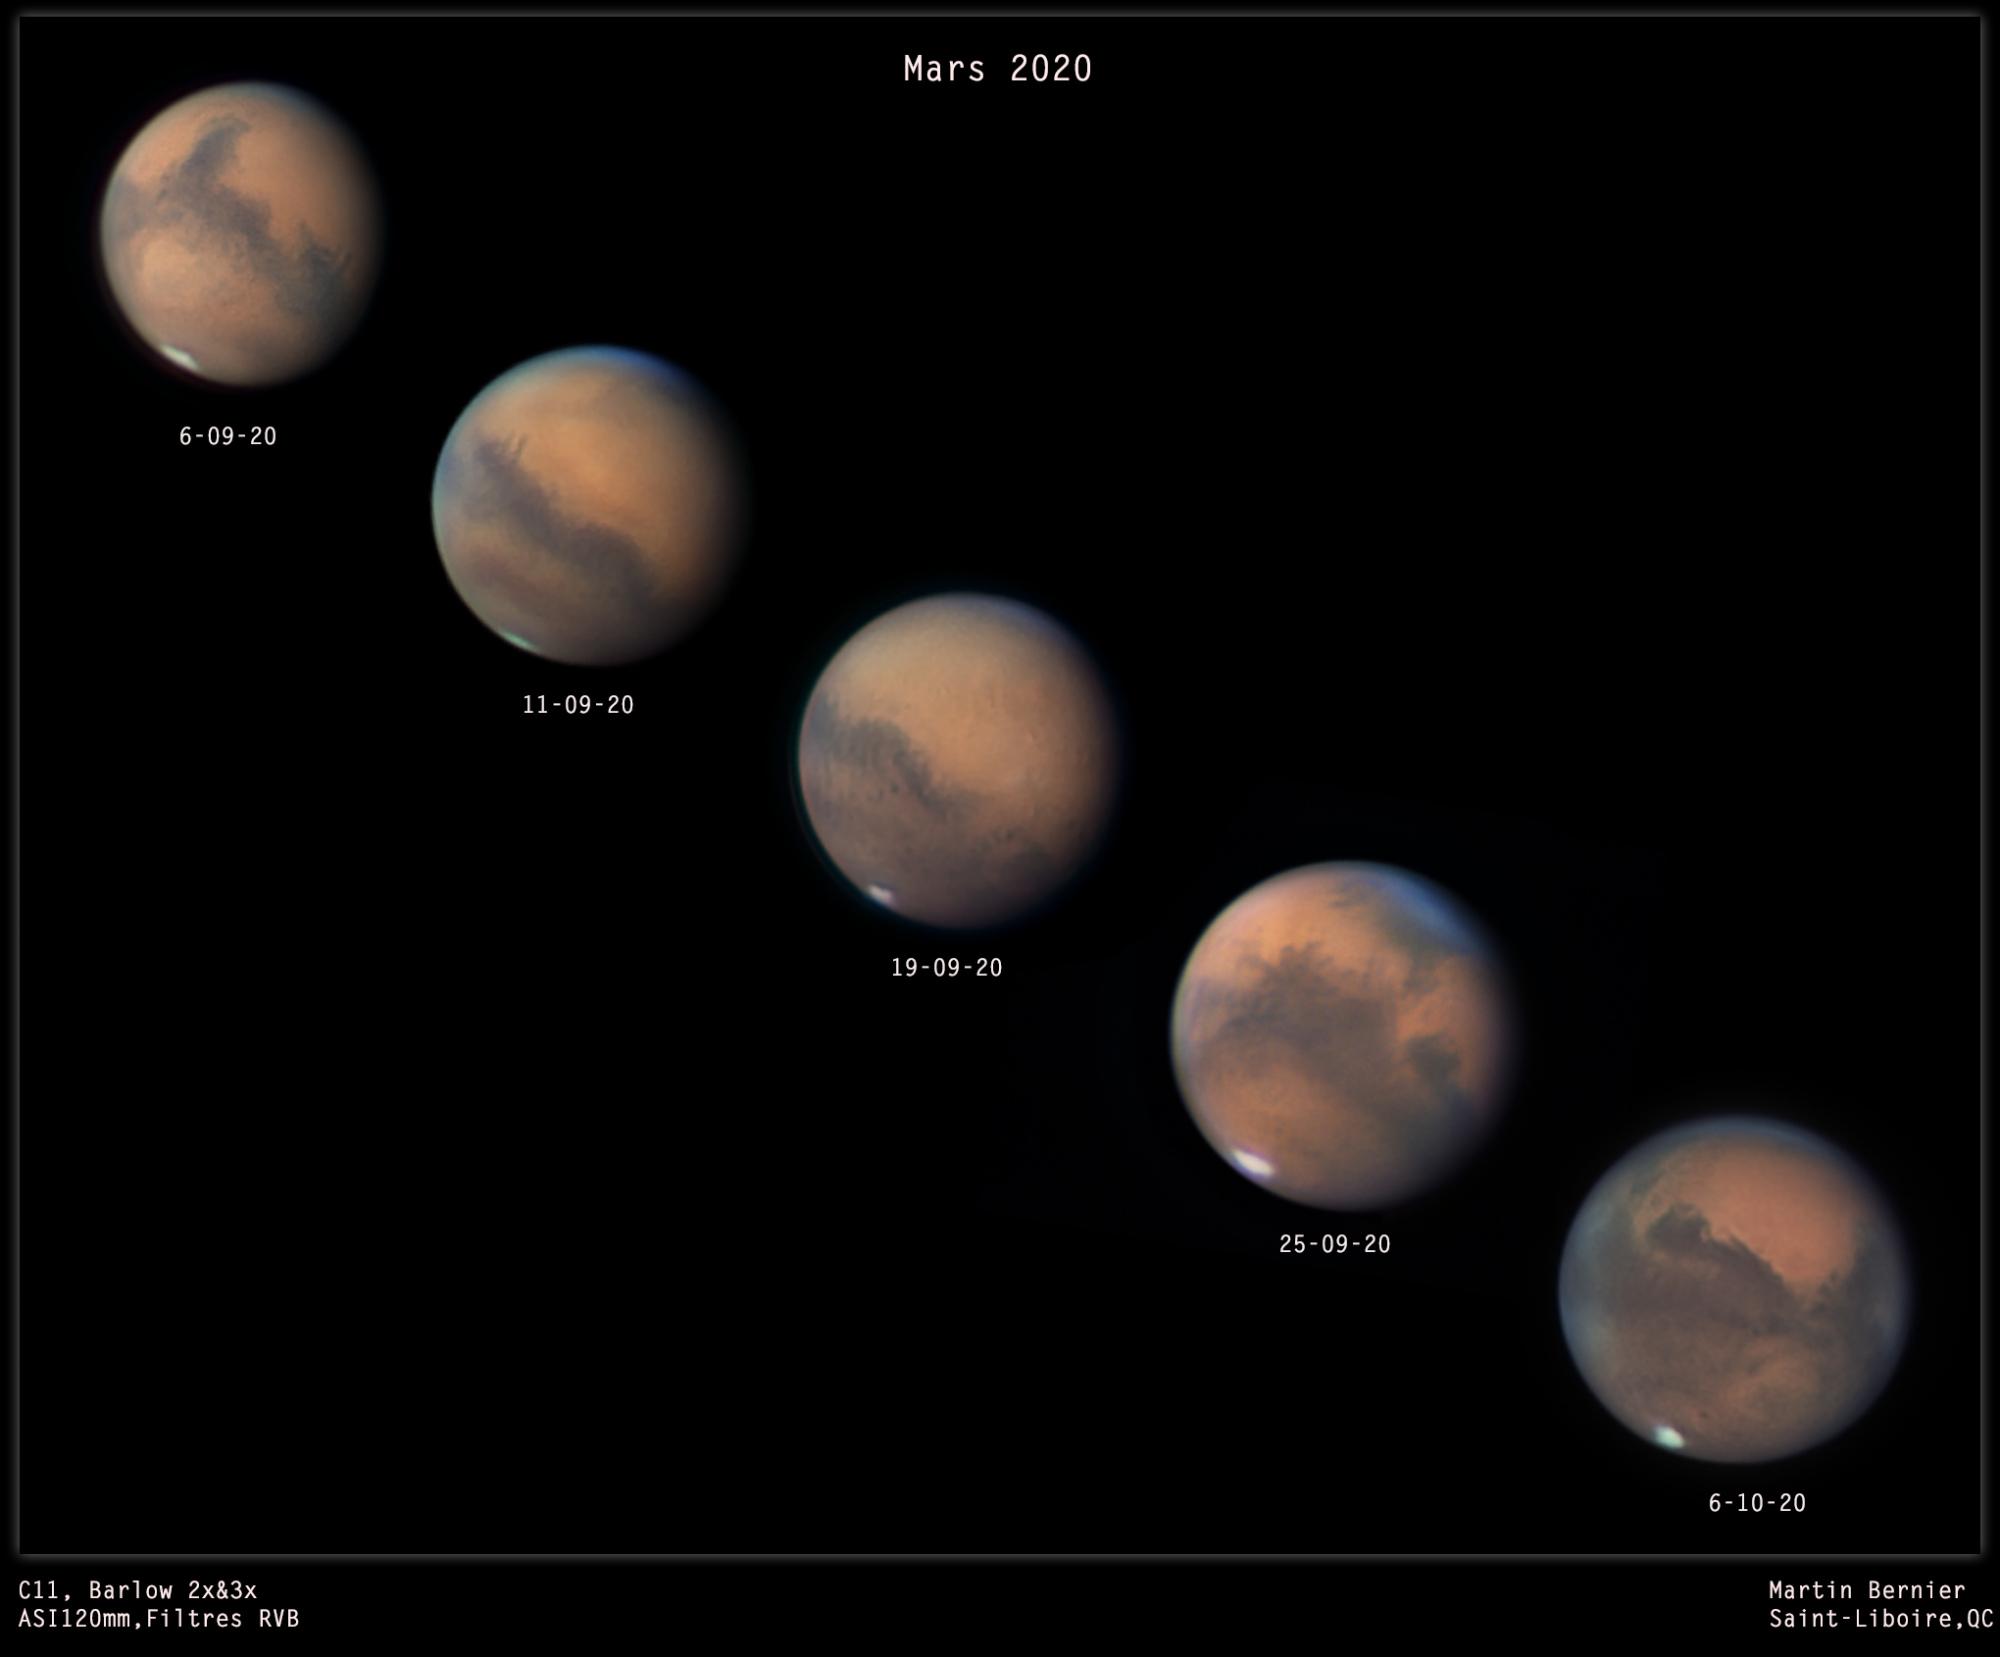 Mars_oppsition2020an.thumb.jpg.49ff73732bde11059e916bac06da3395.jpg